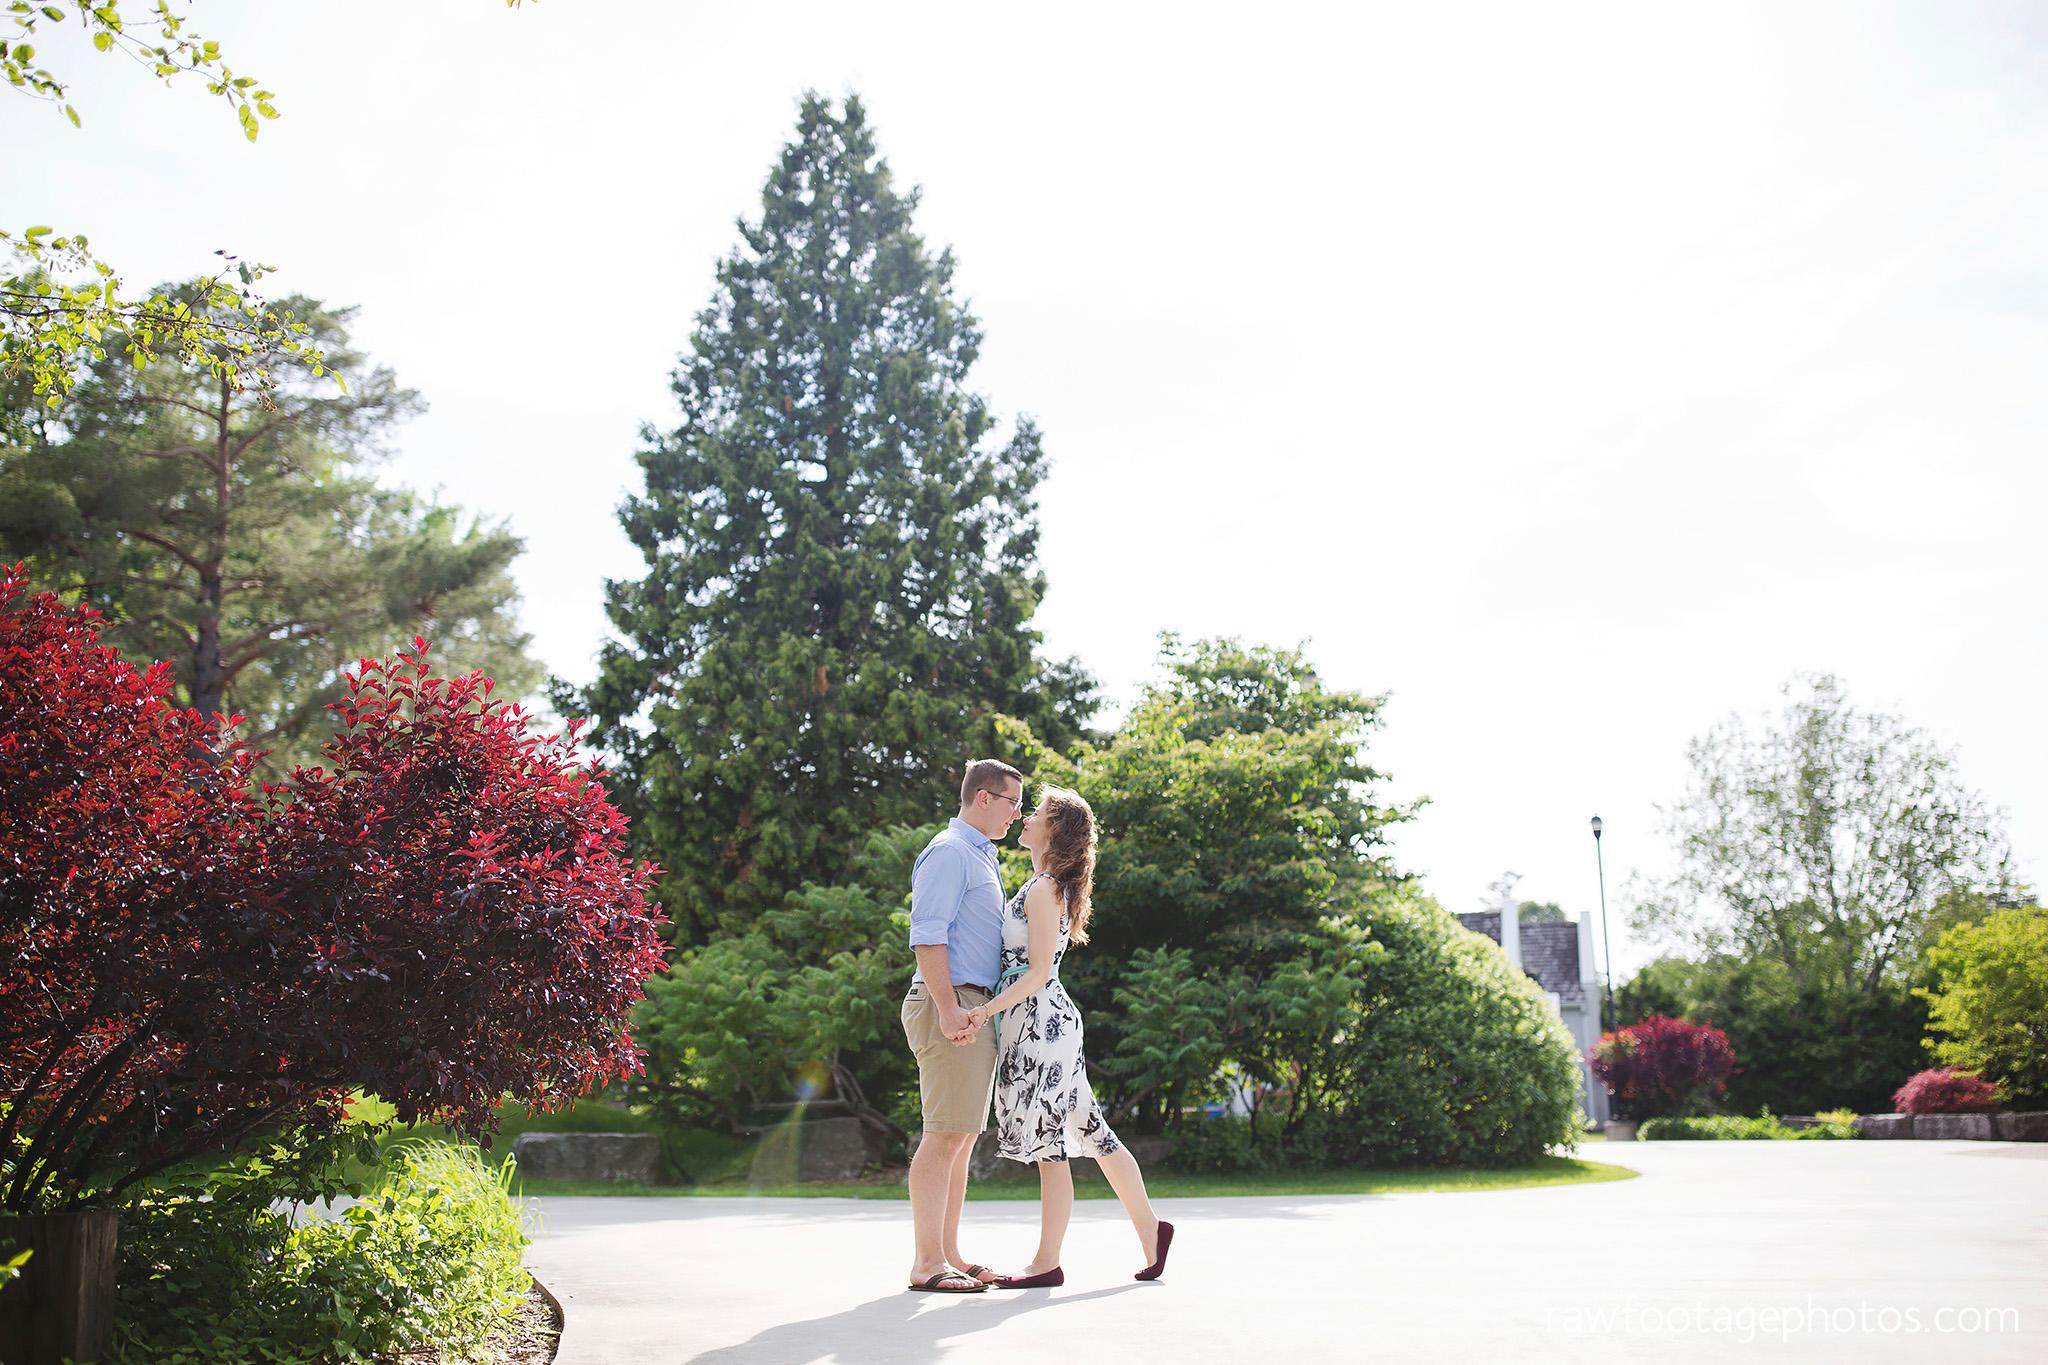 london_ontario_wedding_photographer-storybook_gardens_engagement_session-raw_footage_photography016.jpg